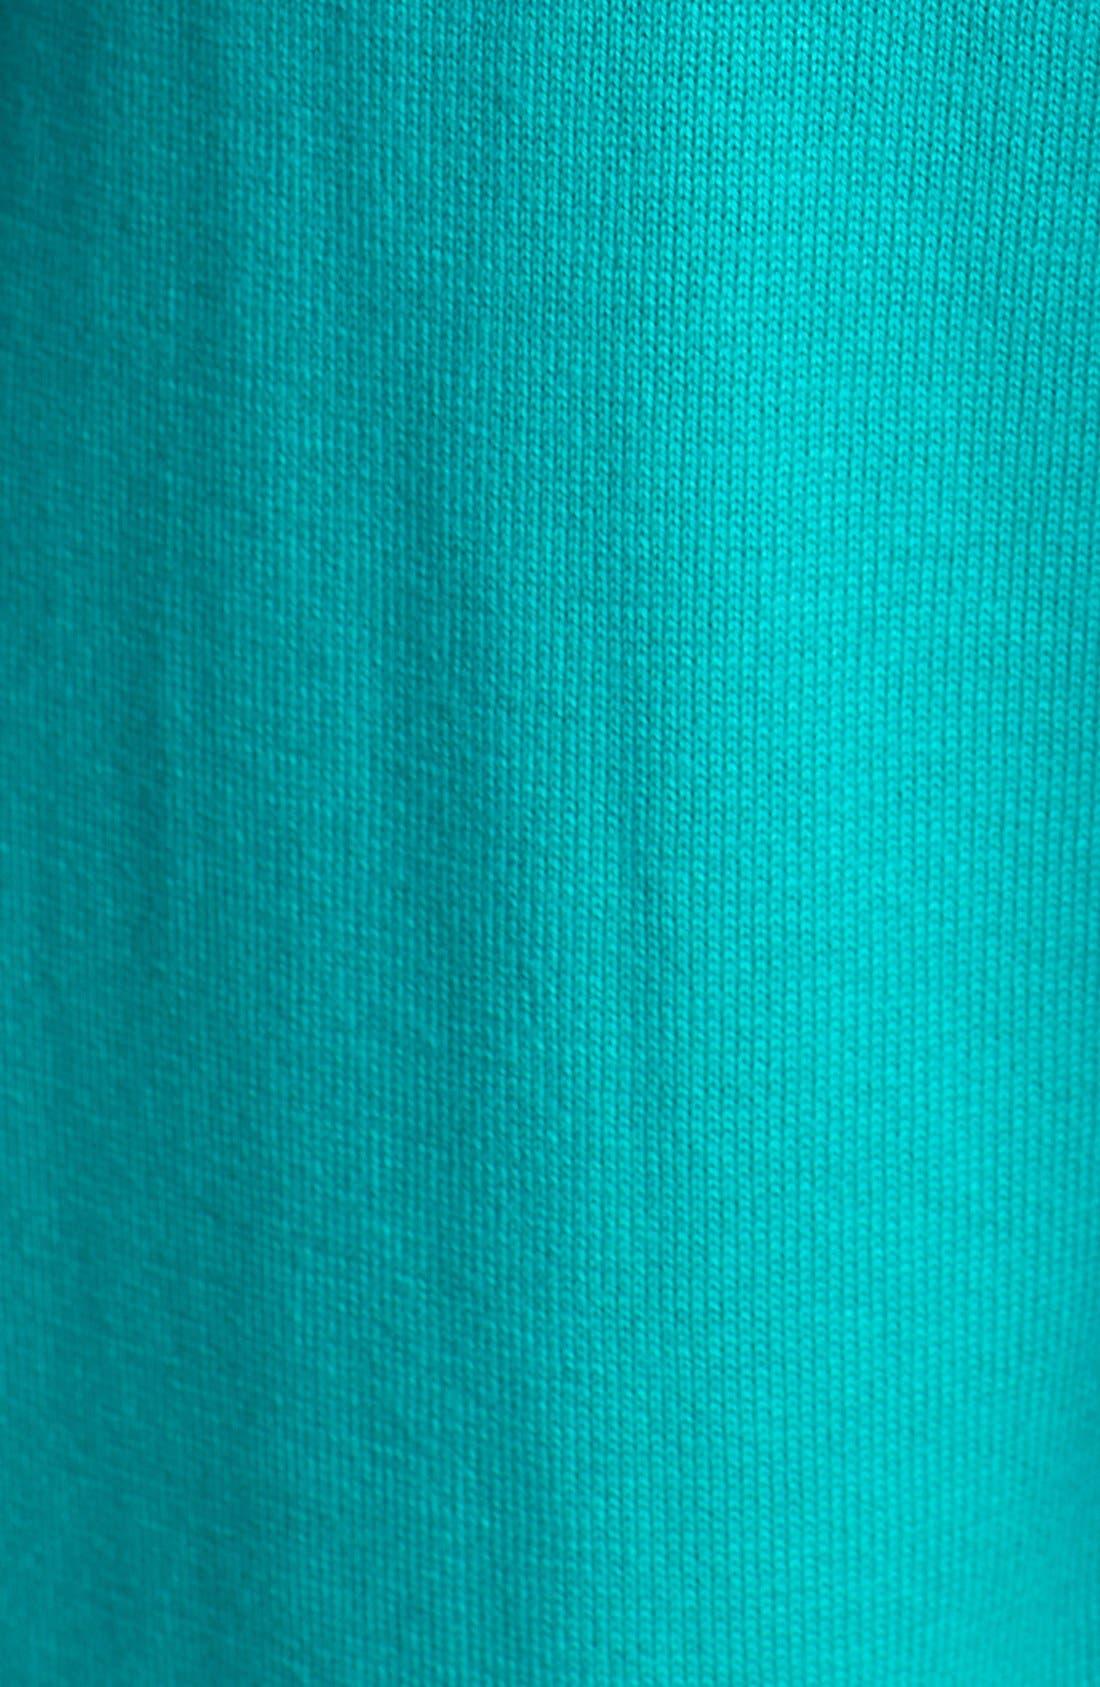 Alternate Image 3  - Vince Camuto Colorblock Cotton Blend Sweater (Petite)